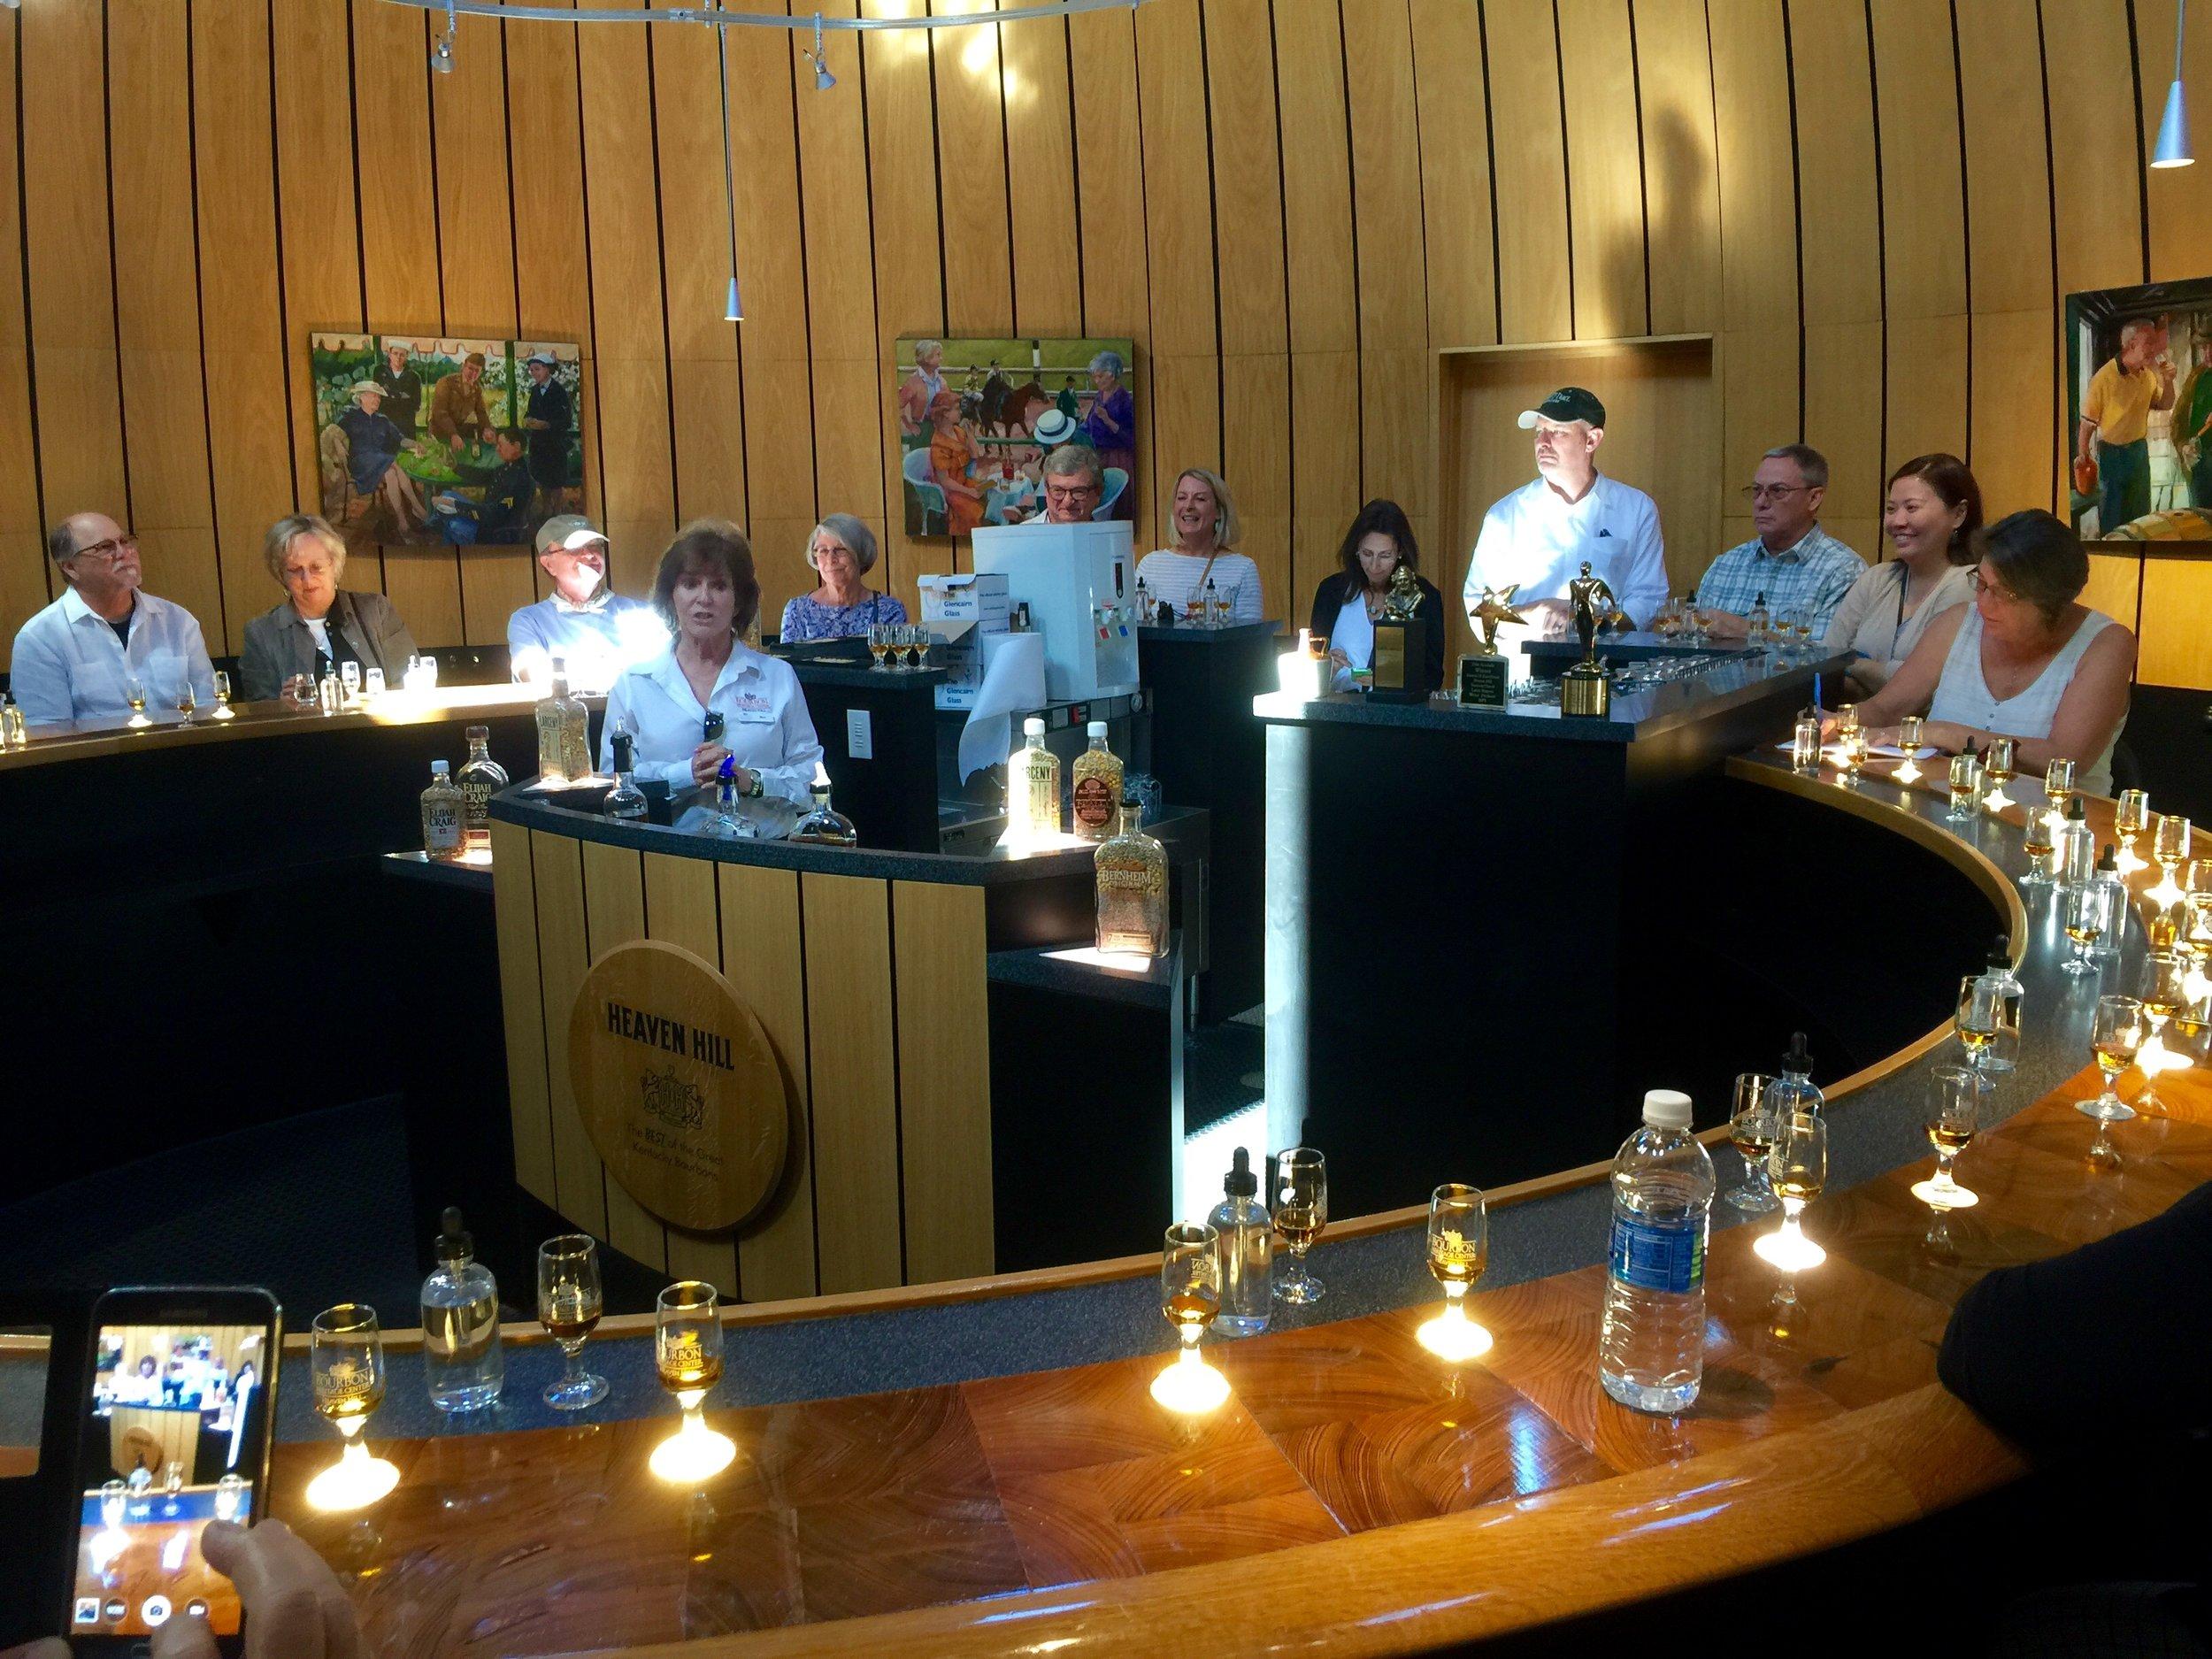 Premium Bourbon tasting in the barrel room bar at Heaven Hill.